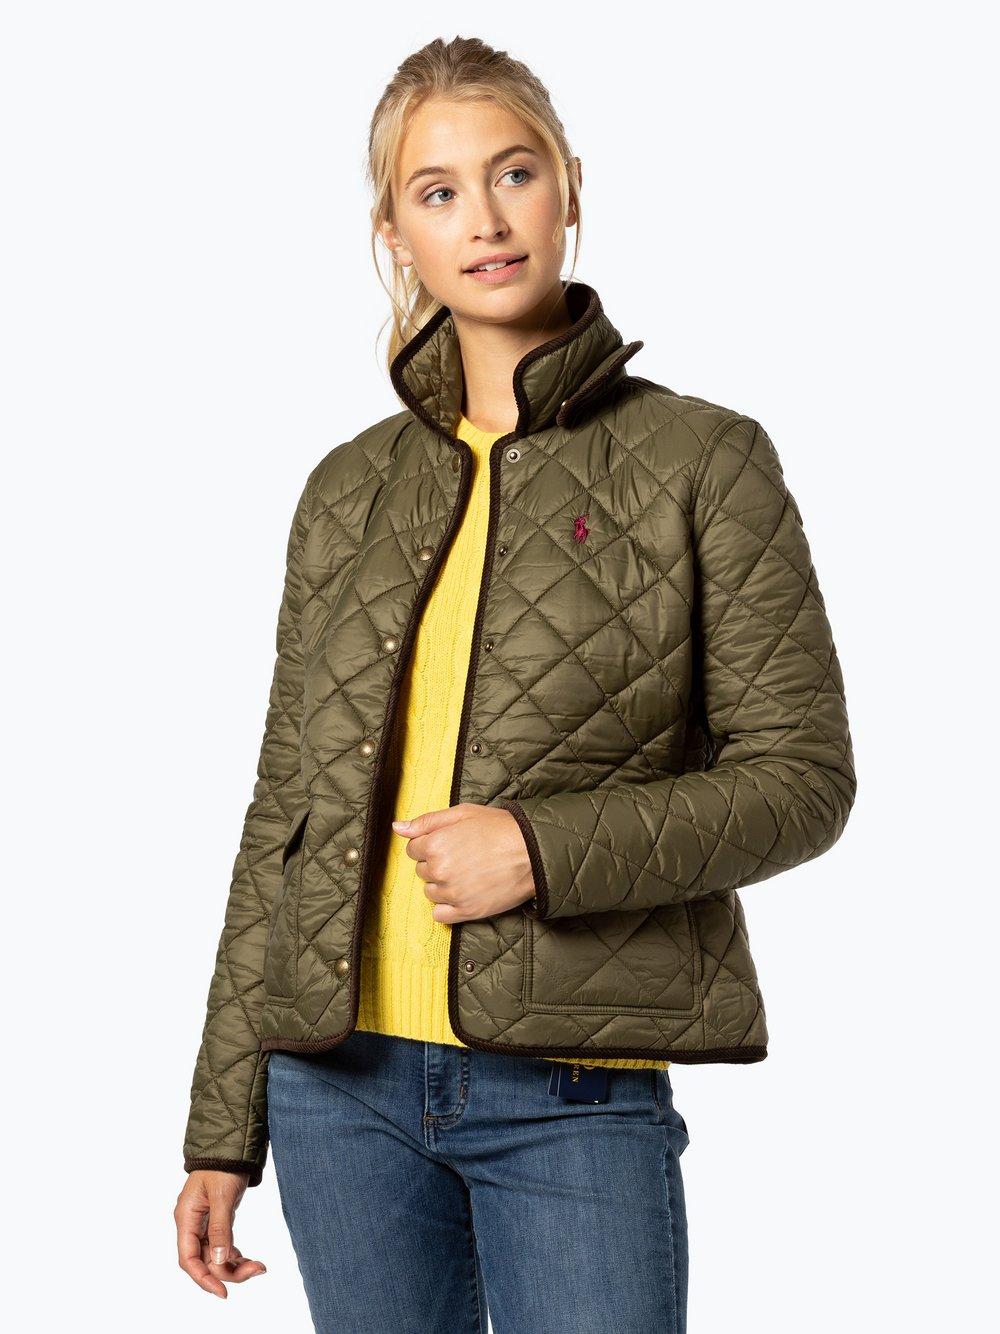 Polo Ralph Lauren - Damska kurtka pikowana, zielony